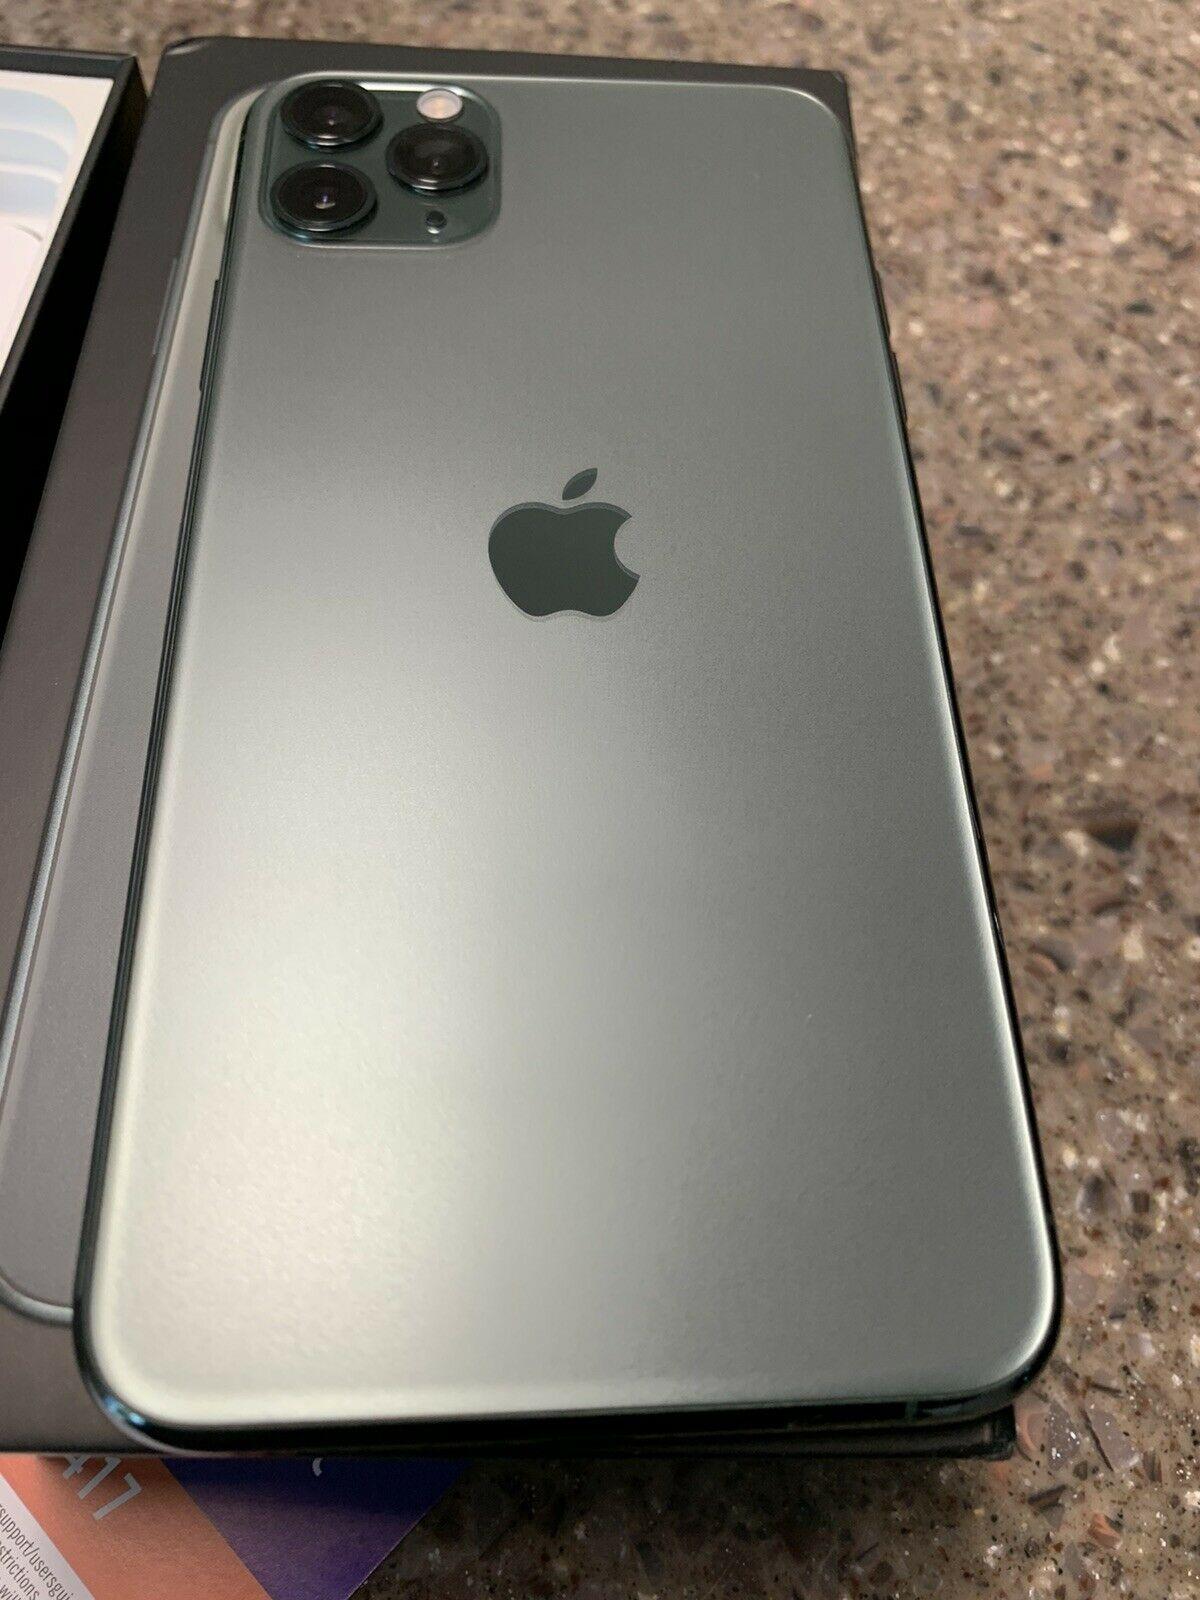 Apple iPhone 11 Pro Max - 256GB - Midnight Green ...